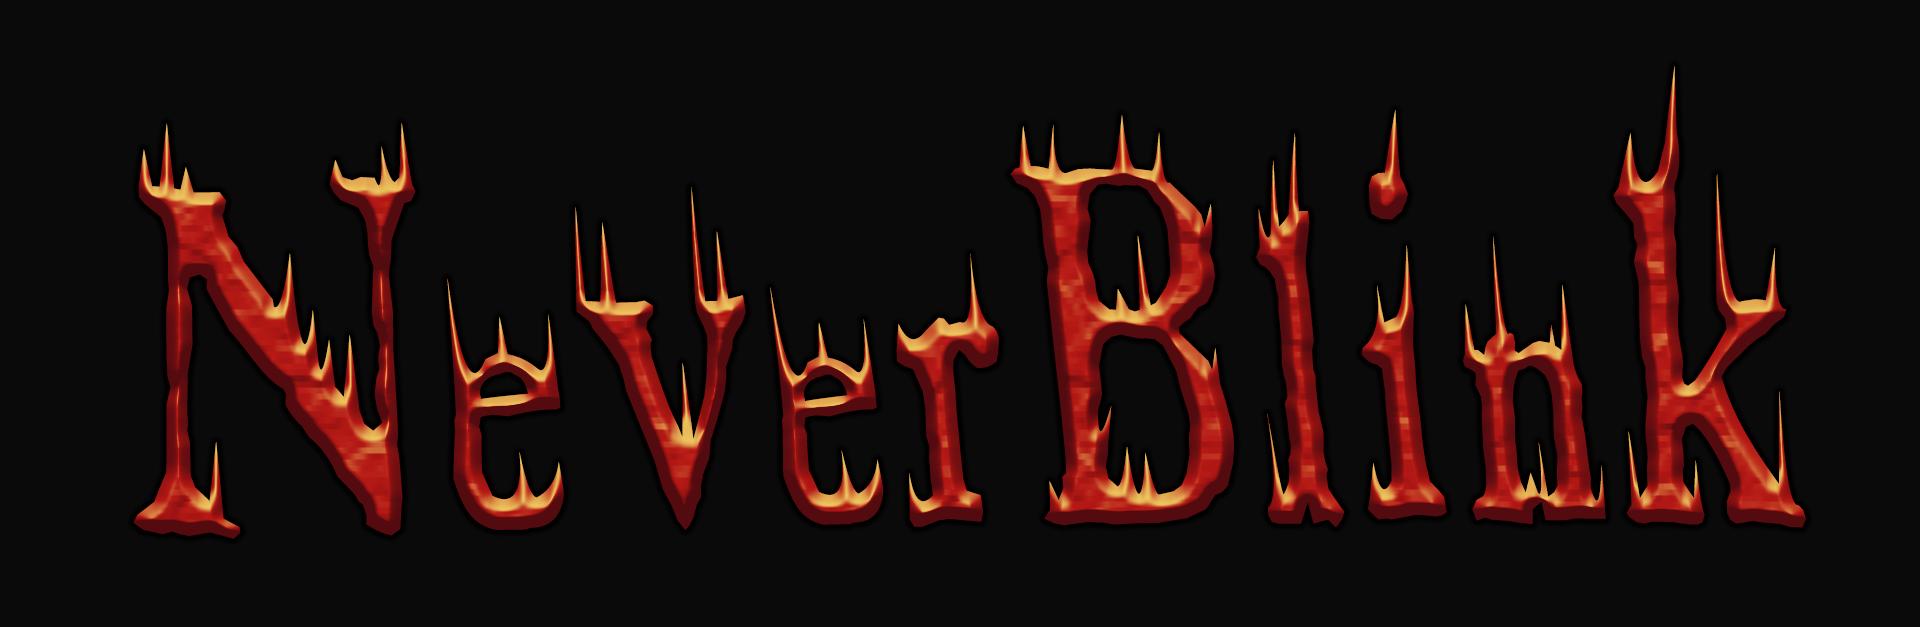 NeverBlink